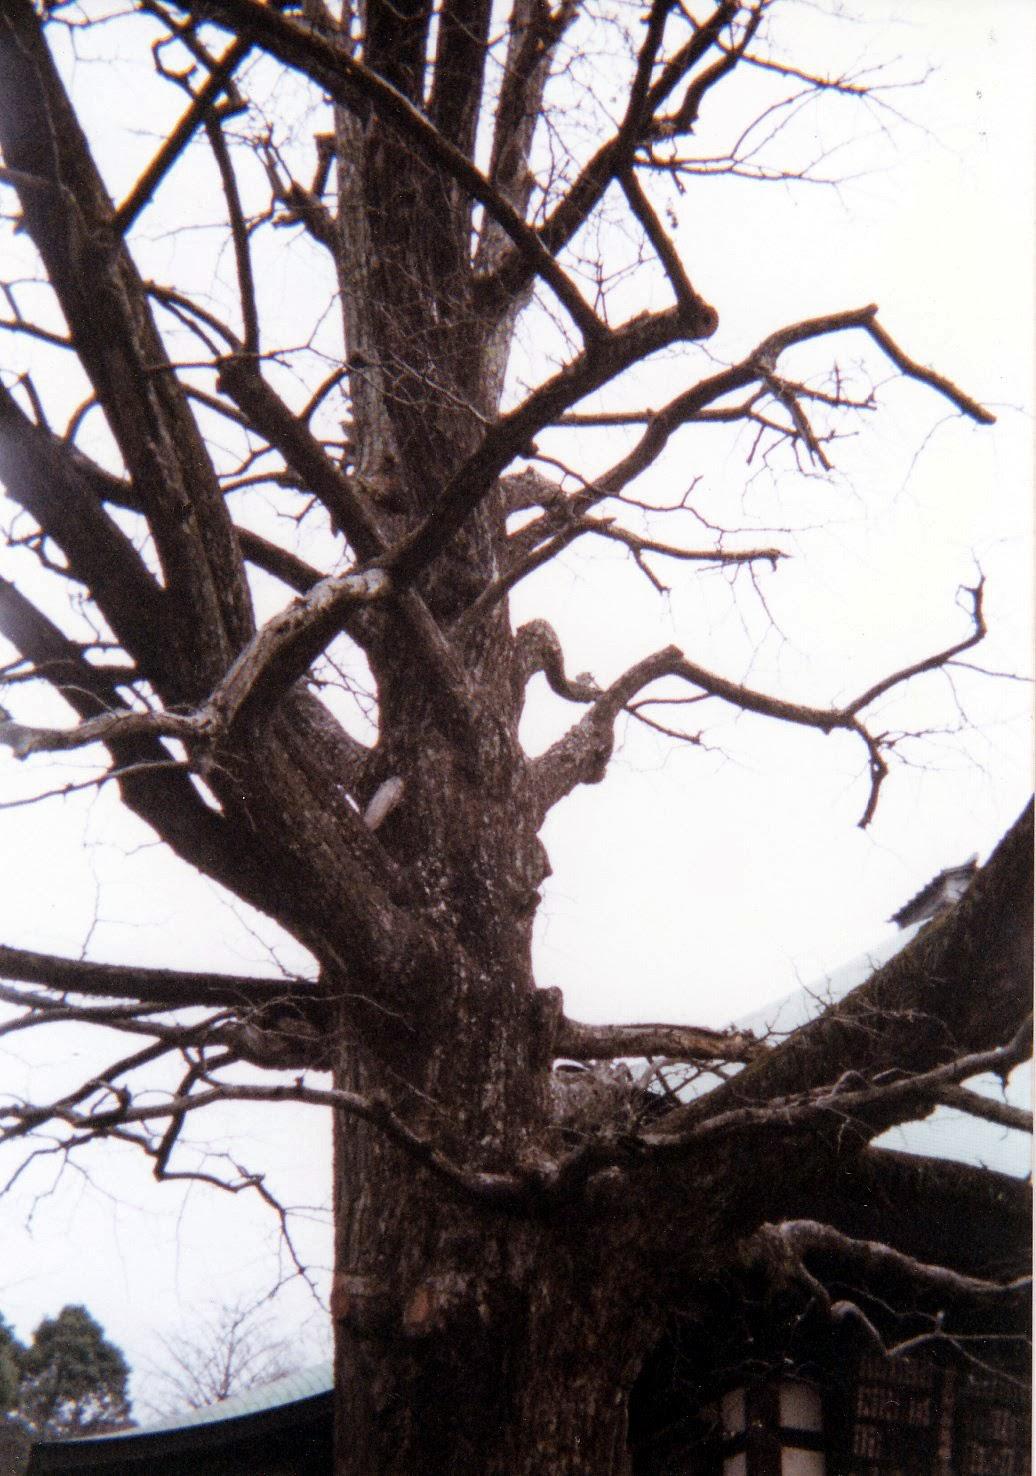 Photo: 九品仏浄真寺(東京都世田谷区) ©赤松幸吉  『愛染かつら』 http://inagara.octsky.net/aizen-katura-1938 (参考)